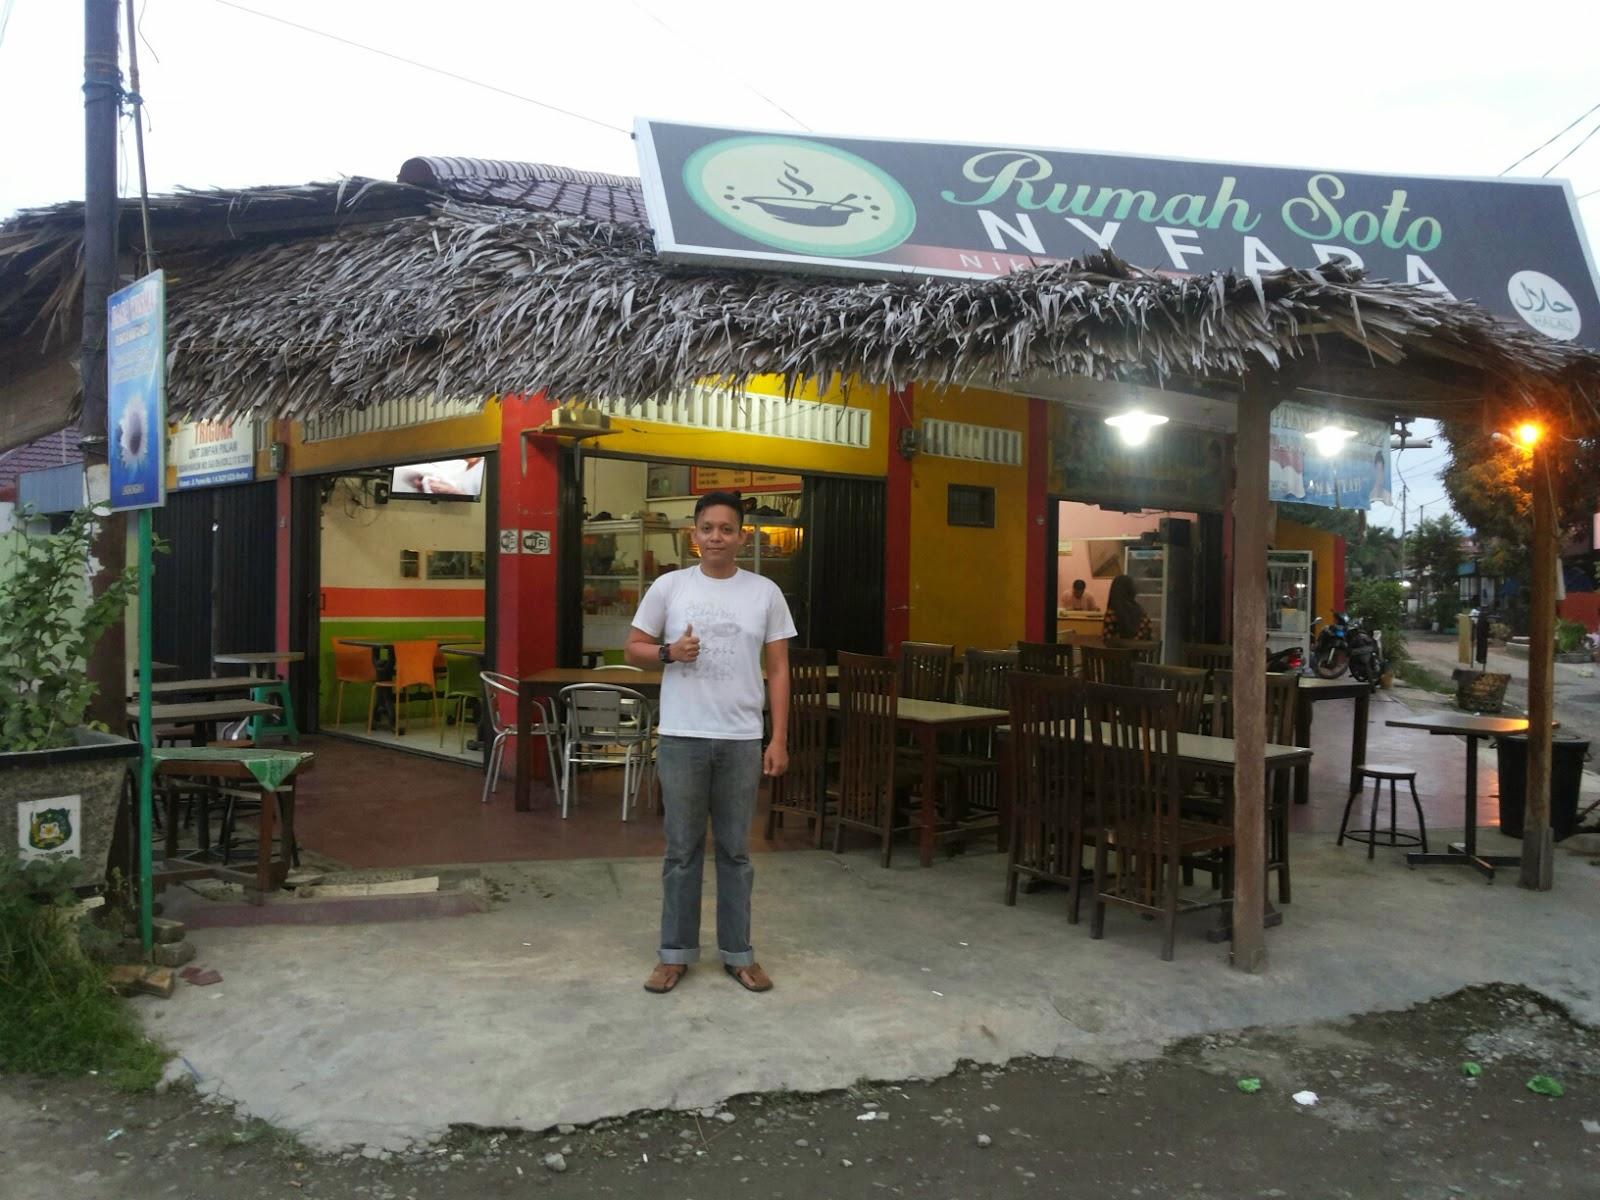 Bermula Kecemplung Nasi Soto, Fajri Siregar owner dari Rumah Soto Nyfara